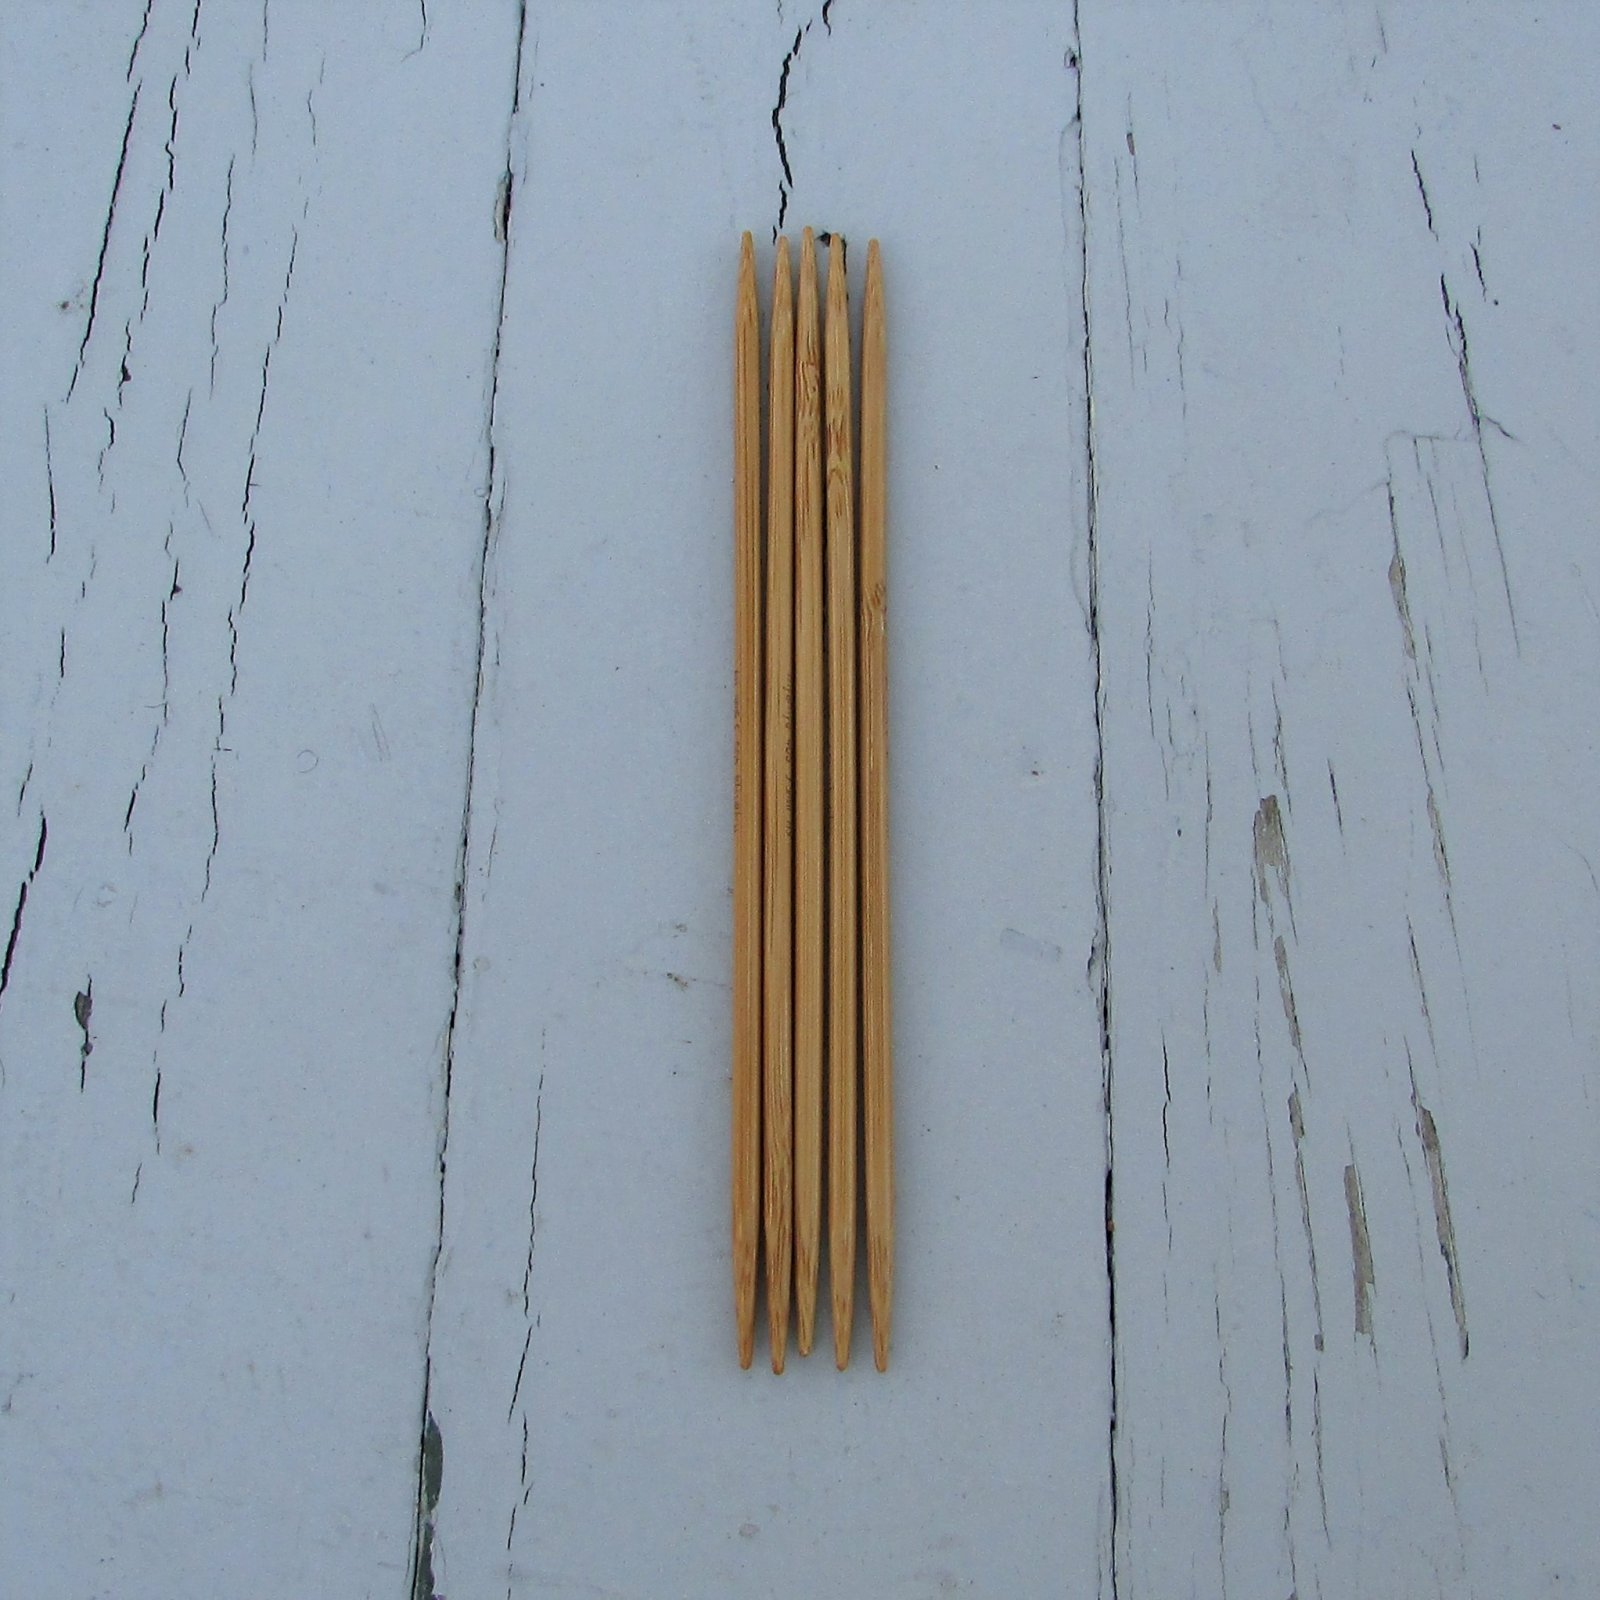 HiyaHiya 5 Bamboo DPNs